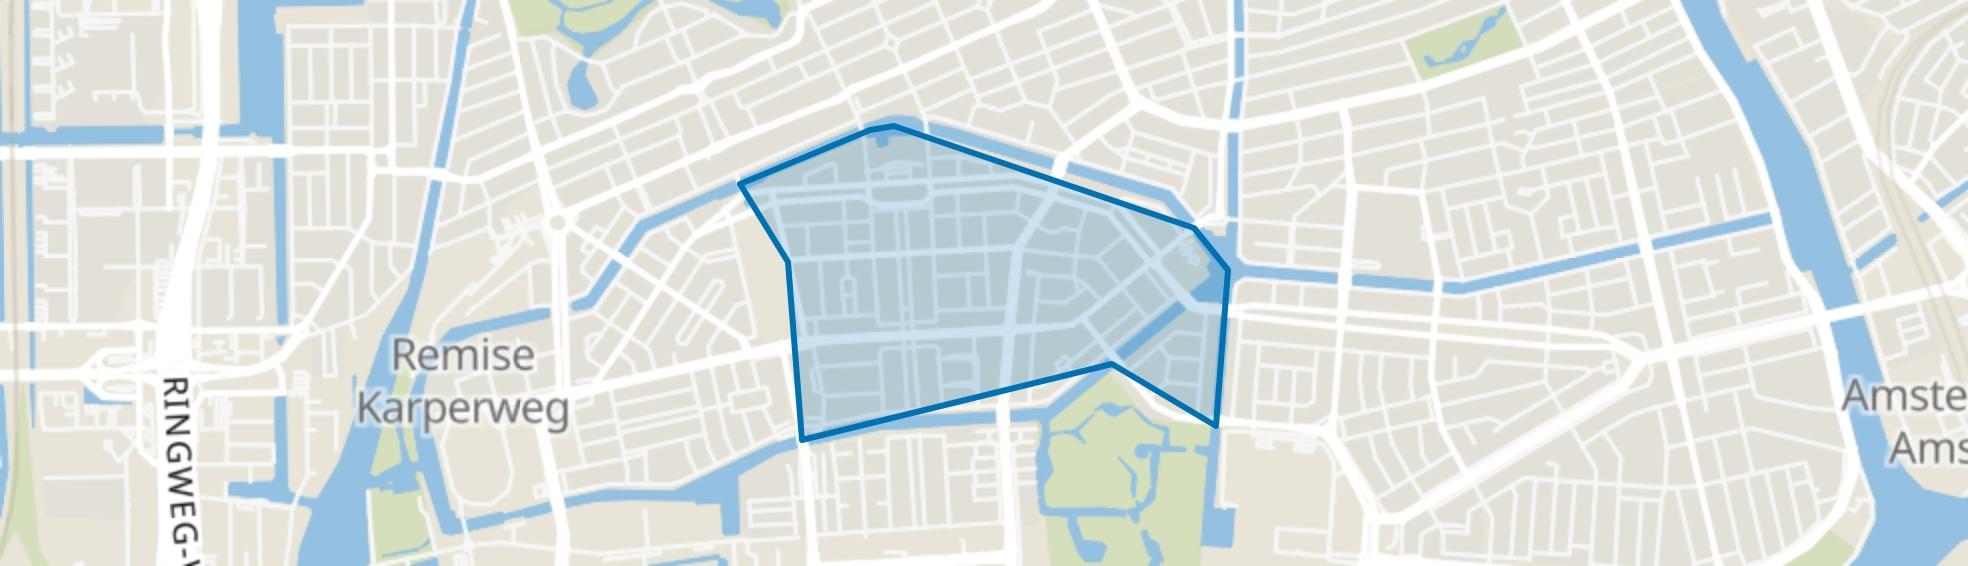 Apollobuurt, Amsterdam map